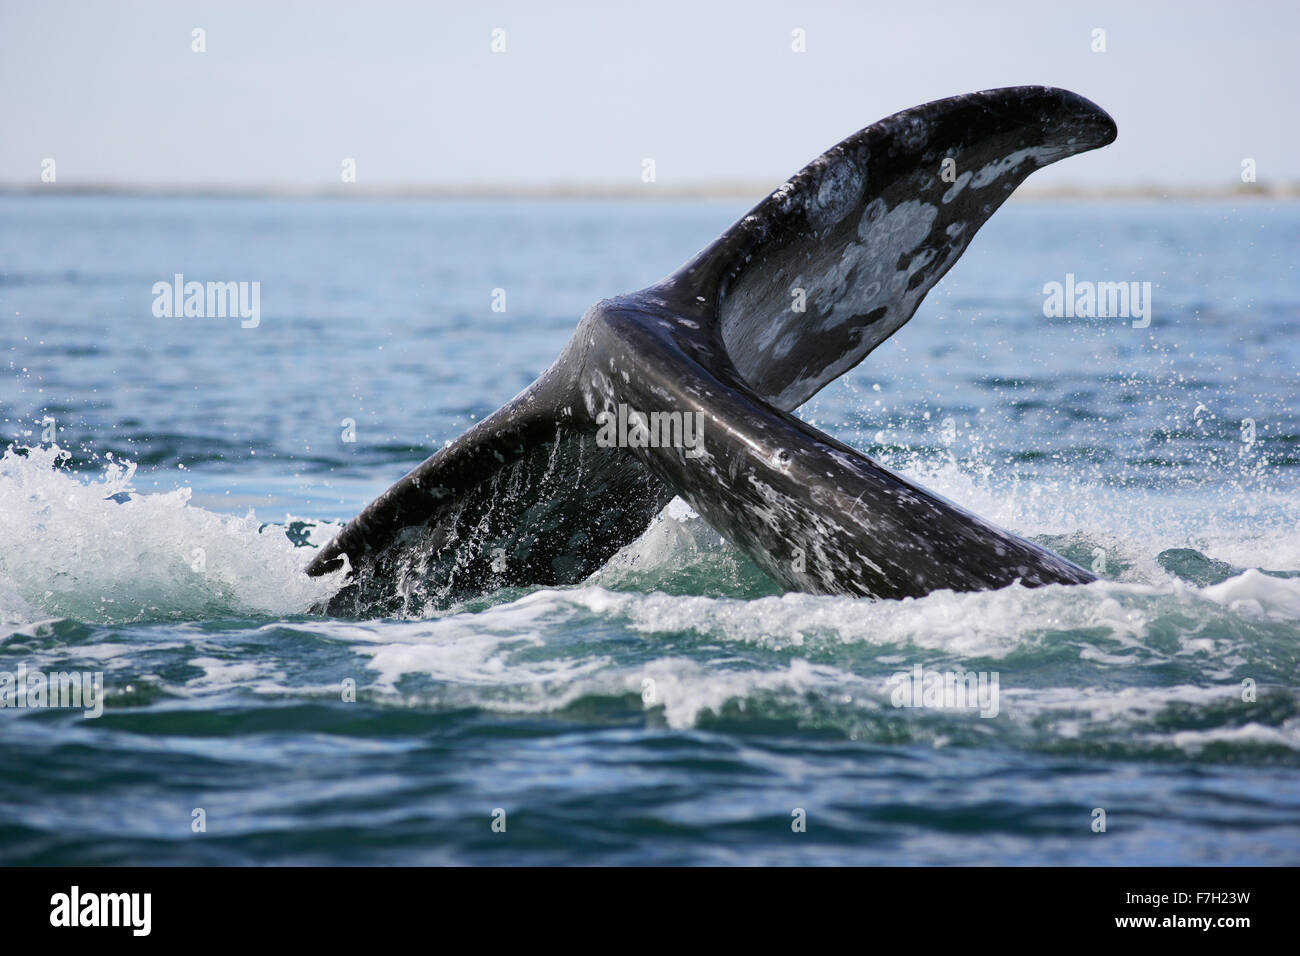 Pr0176-D. La baleine grise (Eschrichtius robustus) lob-tailing. La lagune de San Ignacio, Baja, au Mexique. Photo Photo Stock